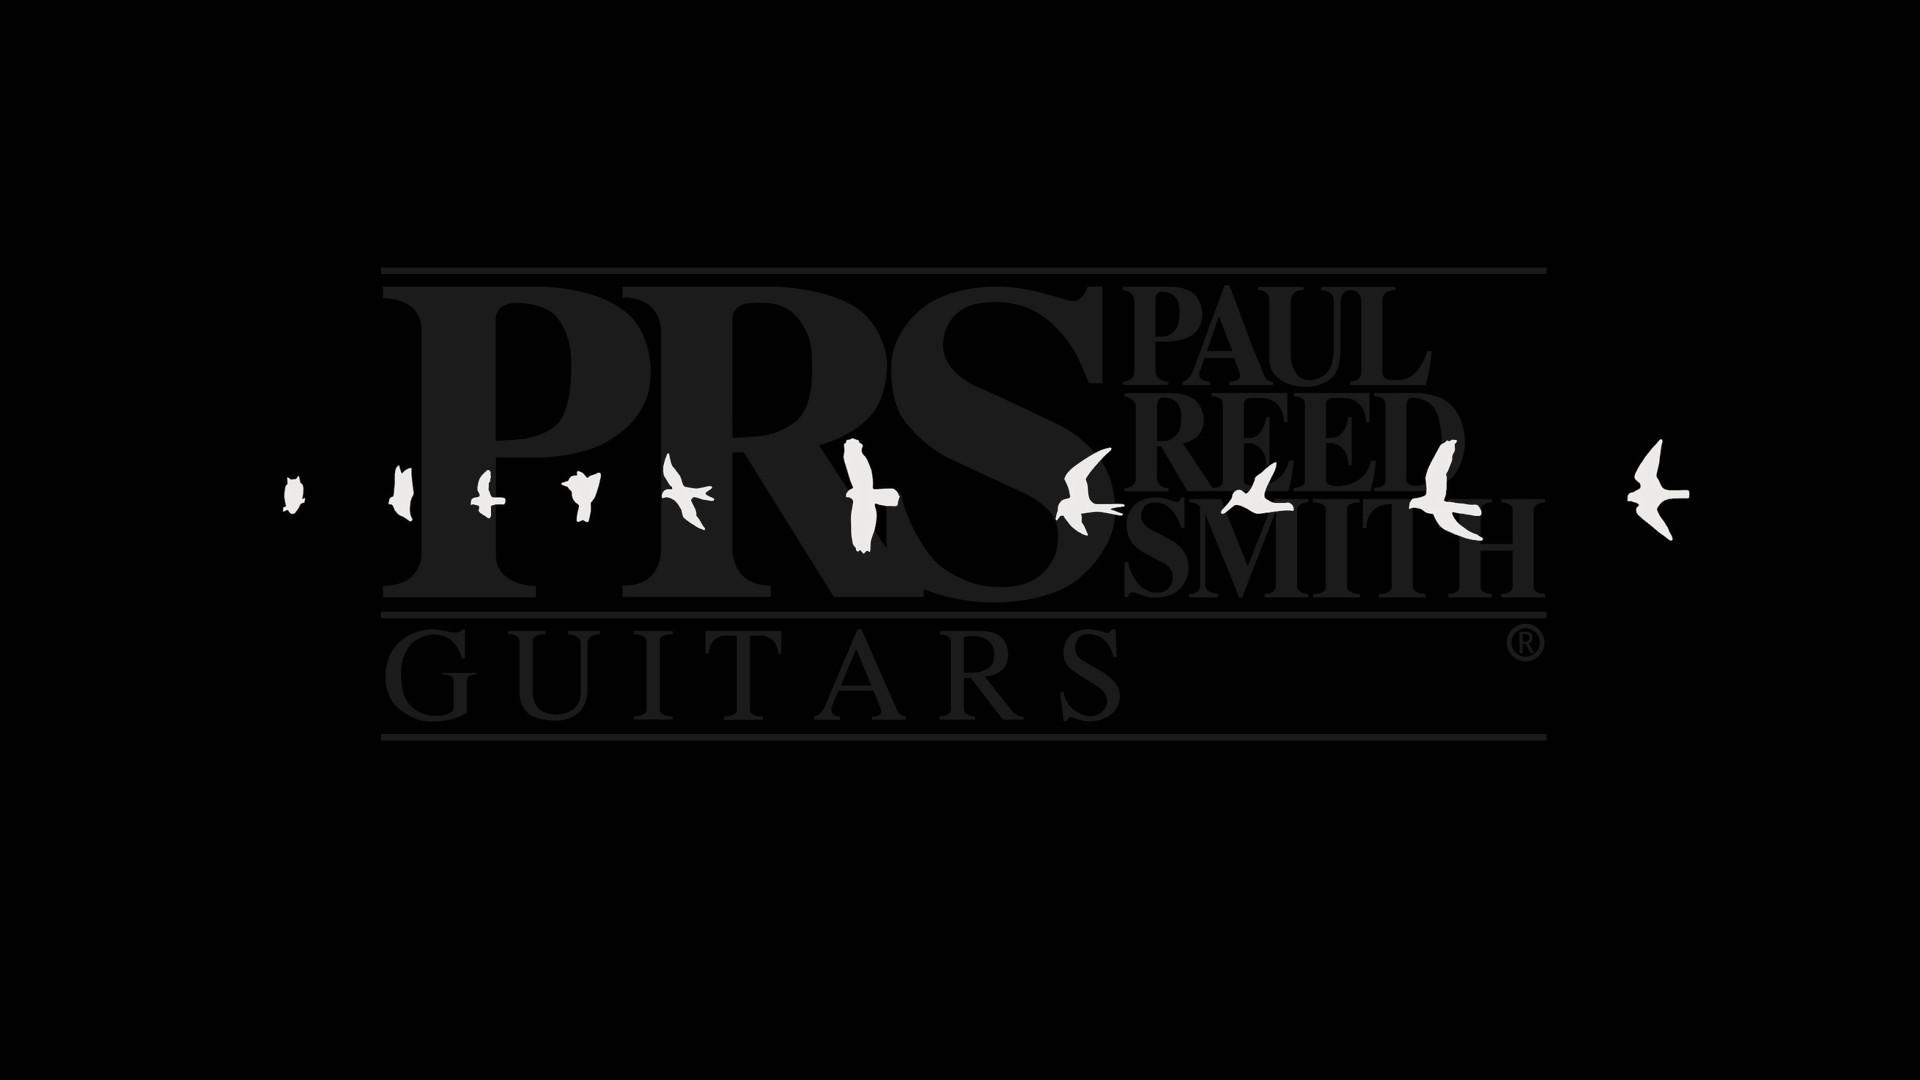 PRS Guitars Wallpaper by VendettAx87 PRS Guitars Wallpaper by VendettAx87